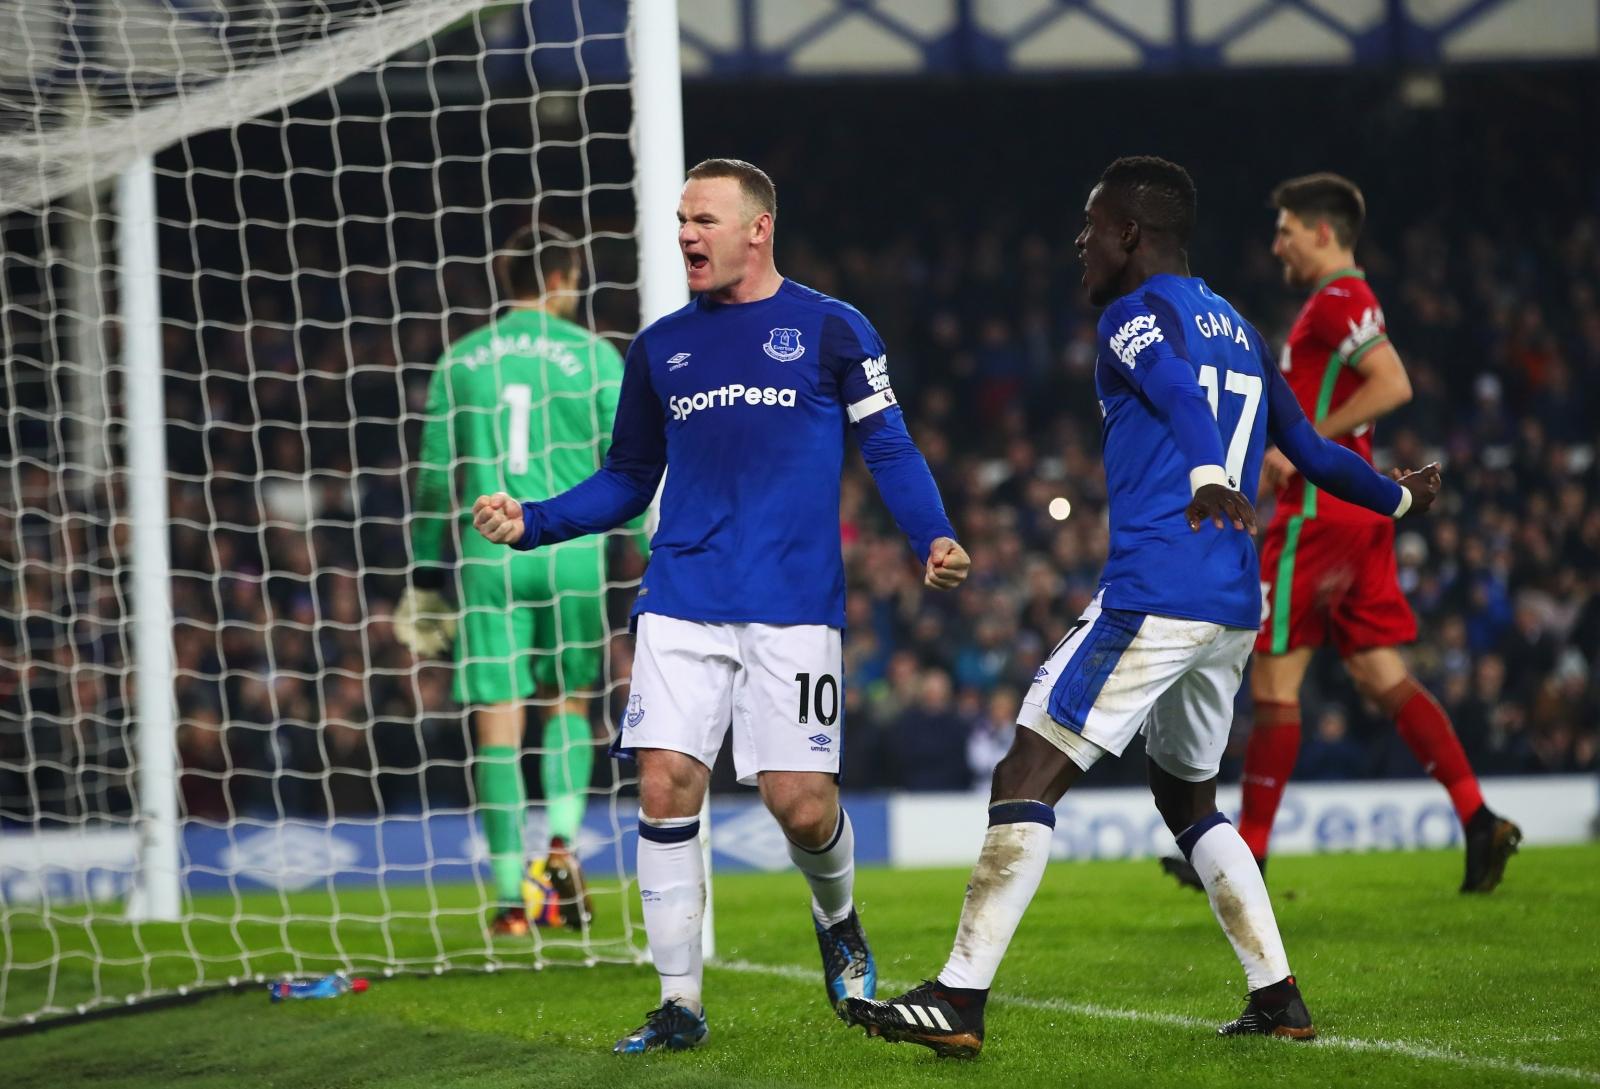 Bournemouth beats Everton to end winless run